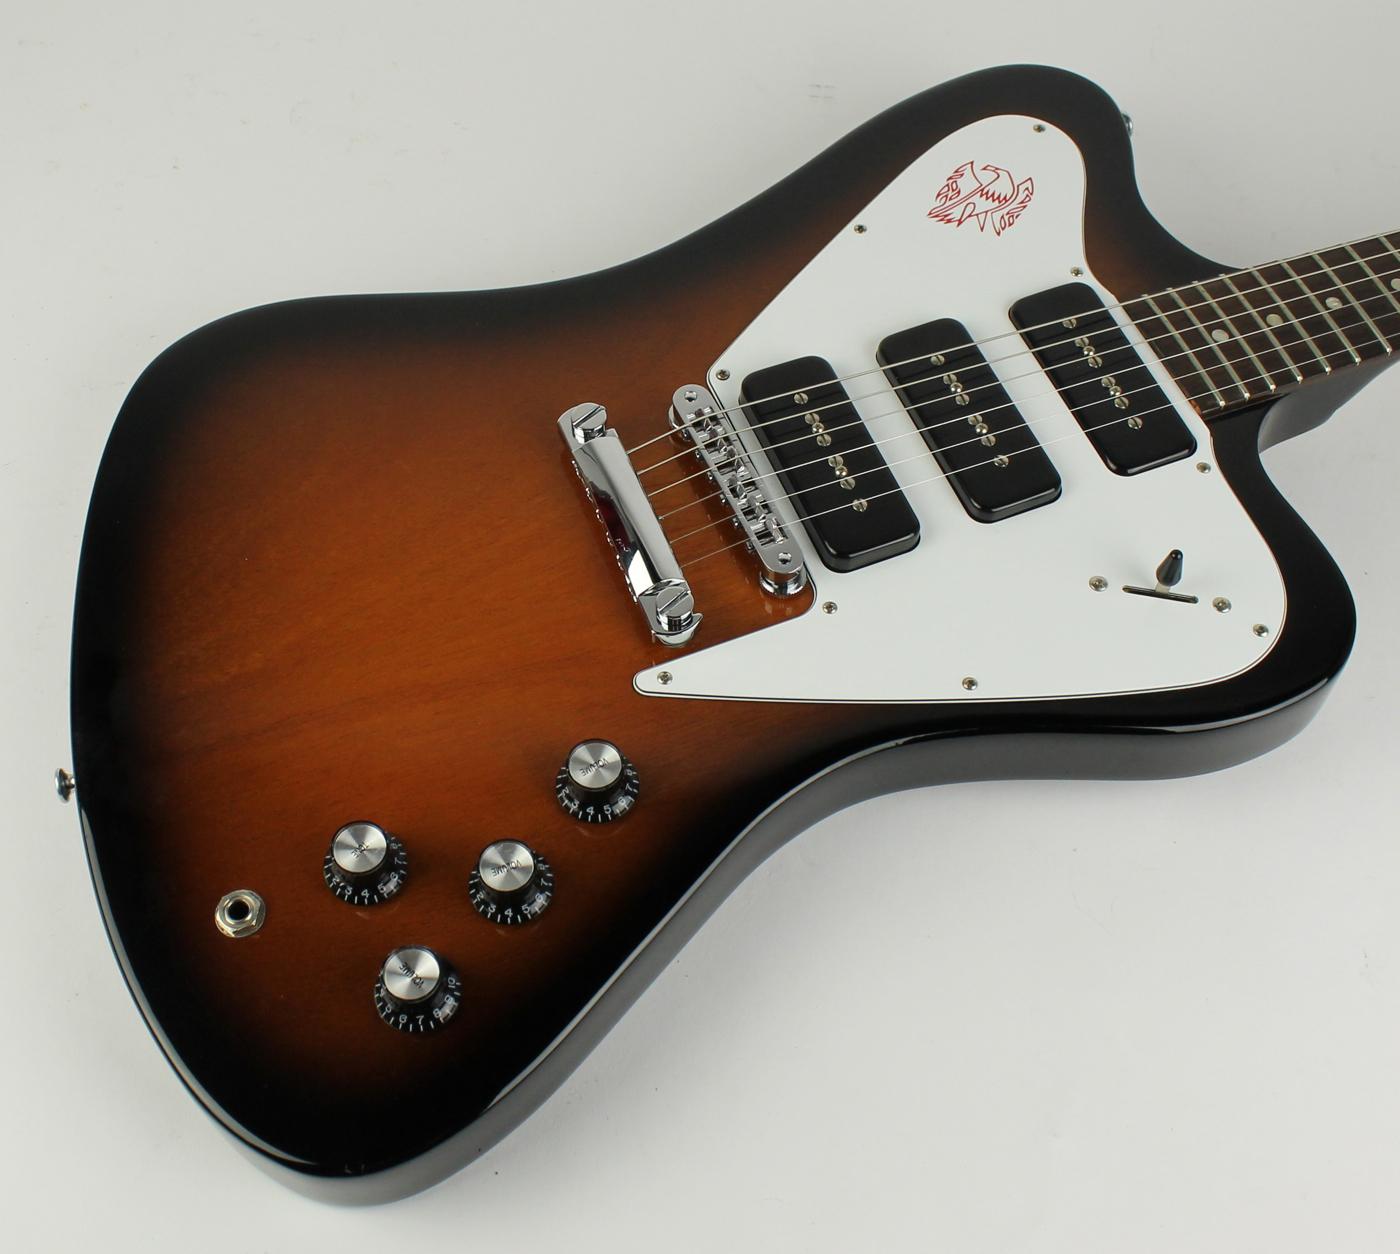 gibson firebird iii non reverse 2011 sunburst guitar for sale thunder road guitars. Black Bedroom Furniture Sets. Home Design Ideas